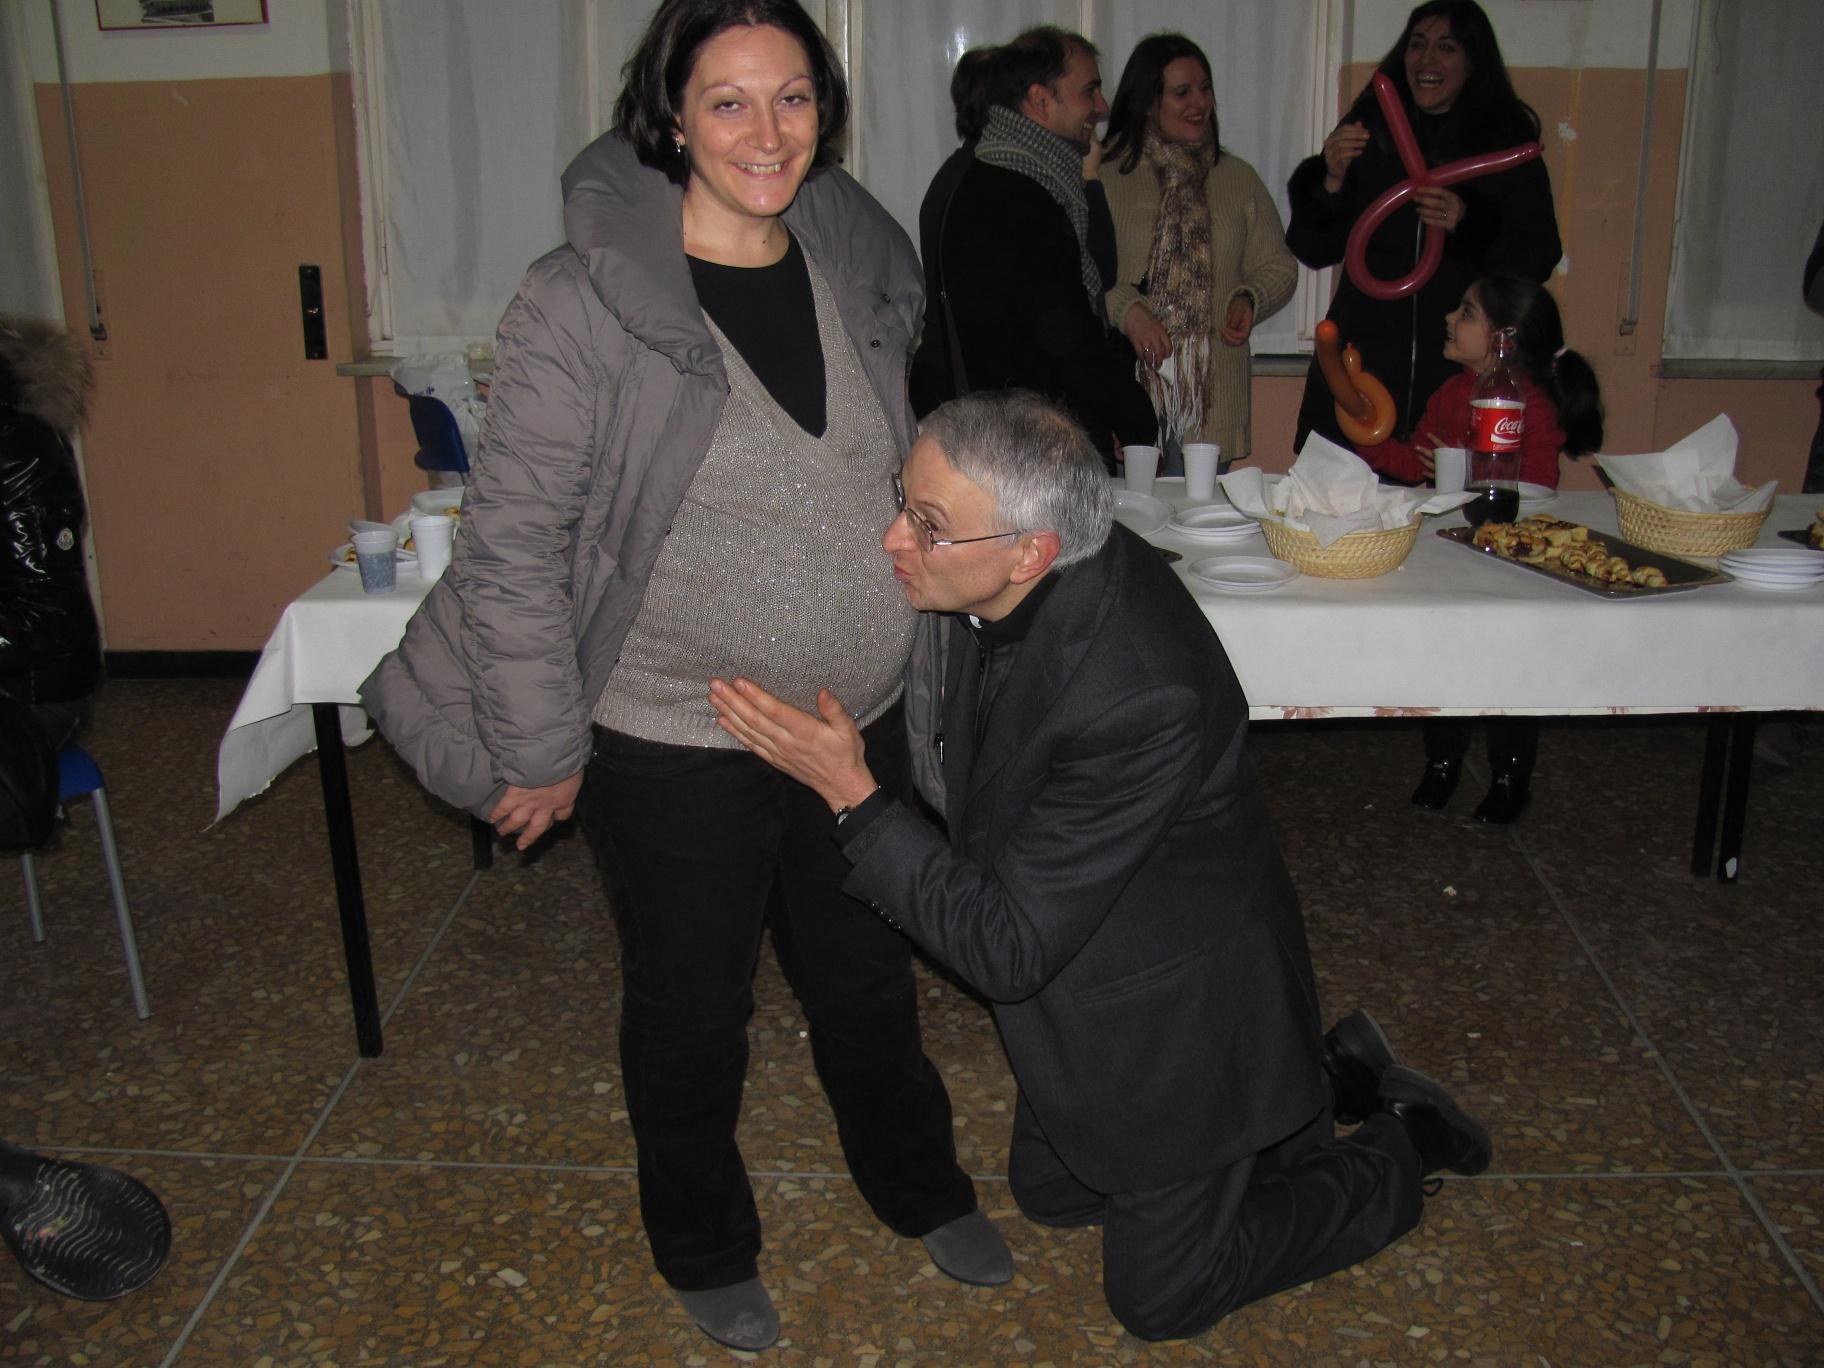 ricordo_battesimo_gesu_2011-01-23-17-04-52